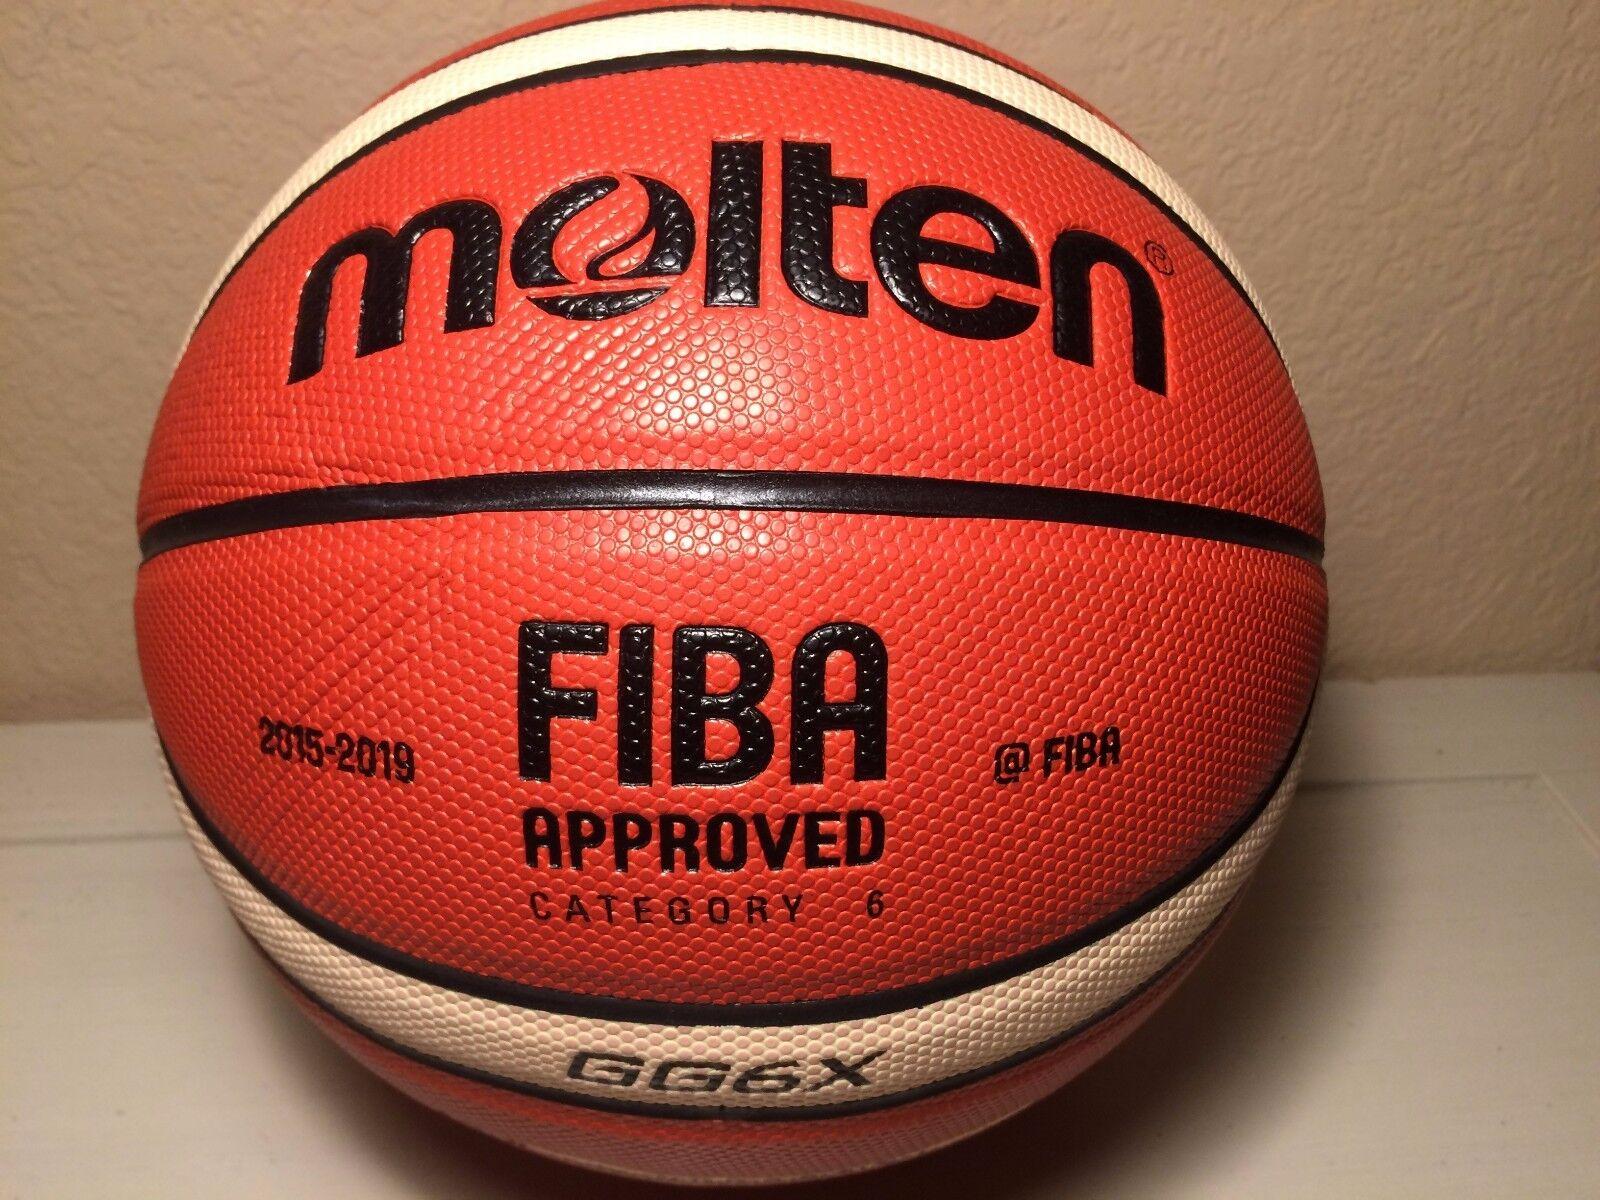 Molten GG6X Basketball Premium Composite Leather Women's Size 6 - 28.5 US Seller